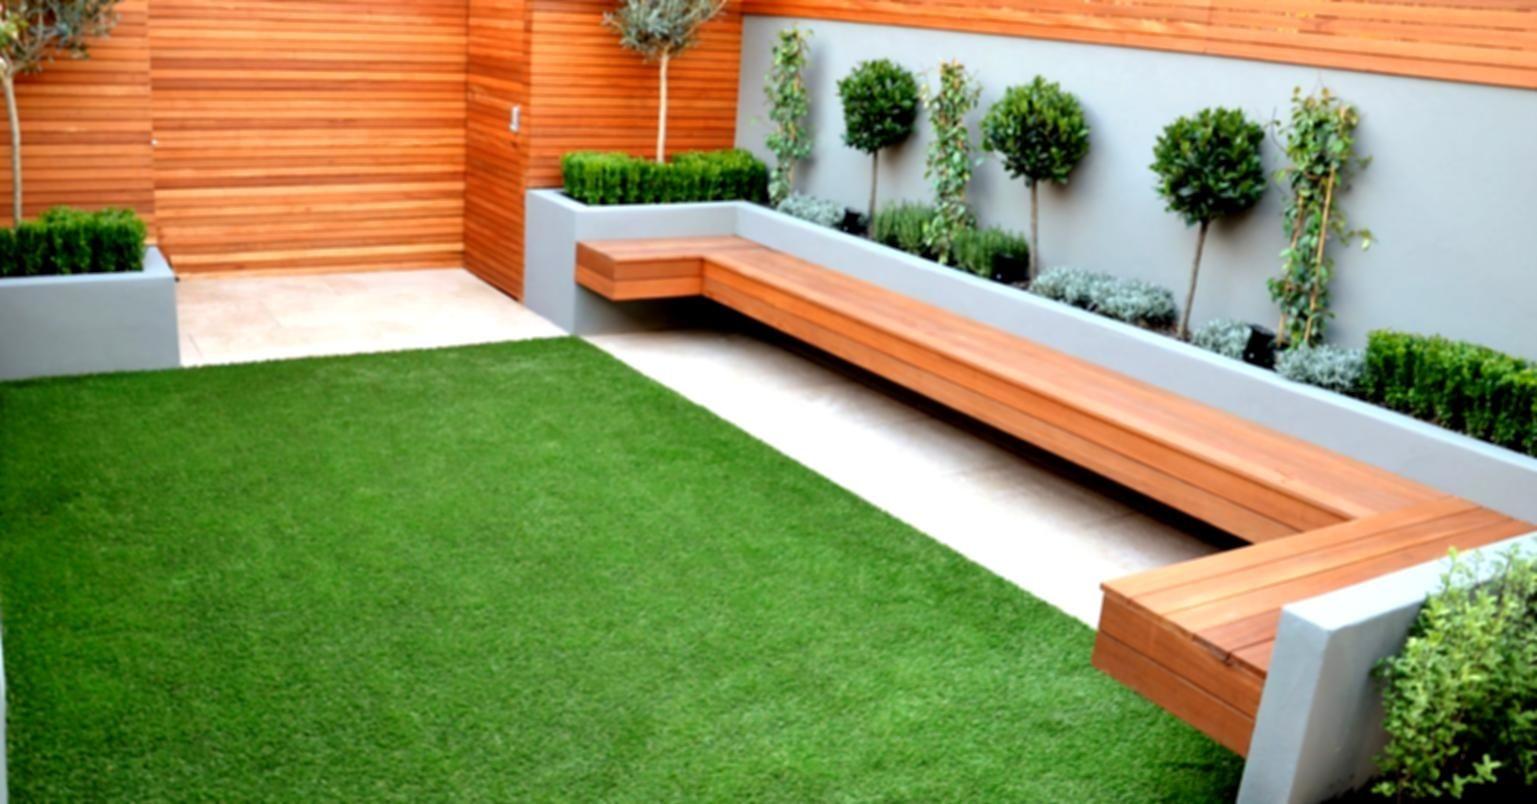 Modern garden design ideas home decorate ideas - Garden Design Ideas Small Gardens Bruce S Angels